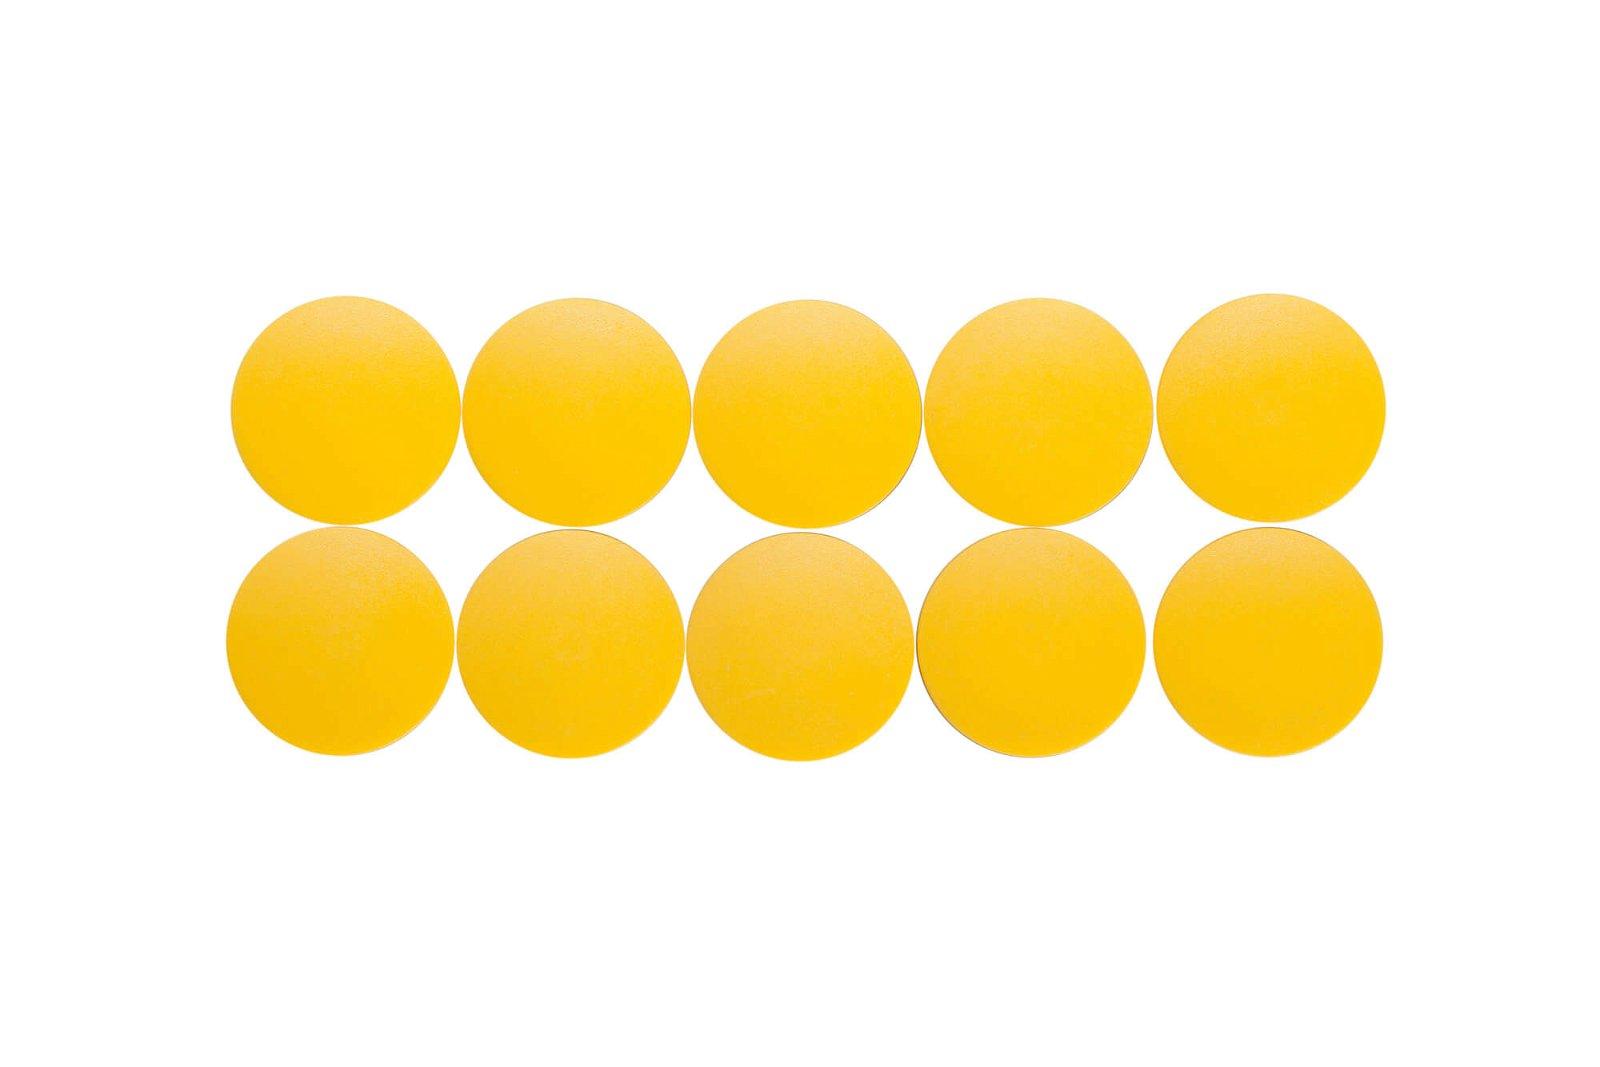 Magnet MAULsolid Ø 32 mm, 0,8 kg Haftkraft, 10 St./Ktn., gelb